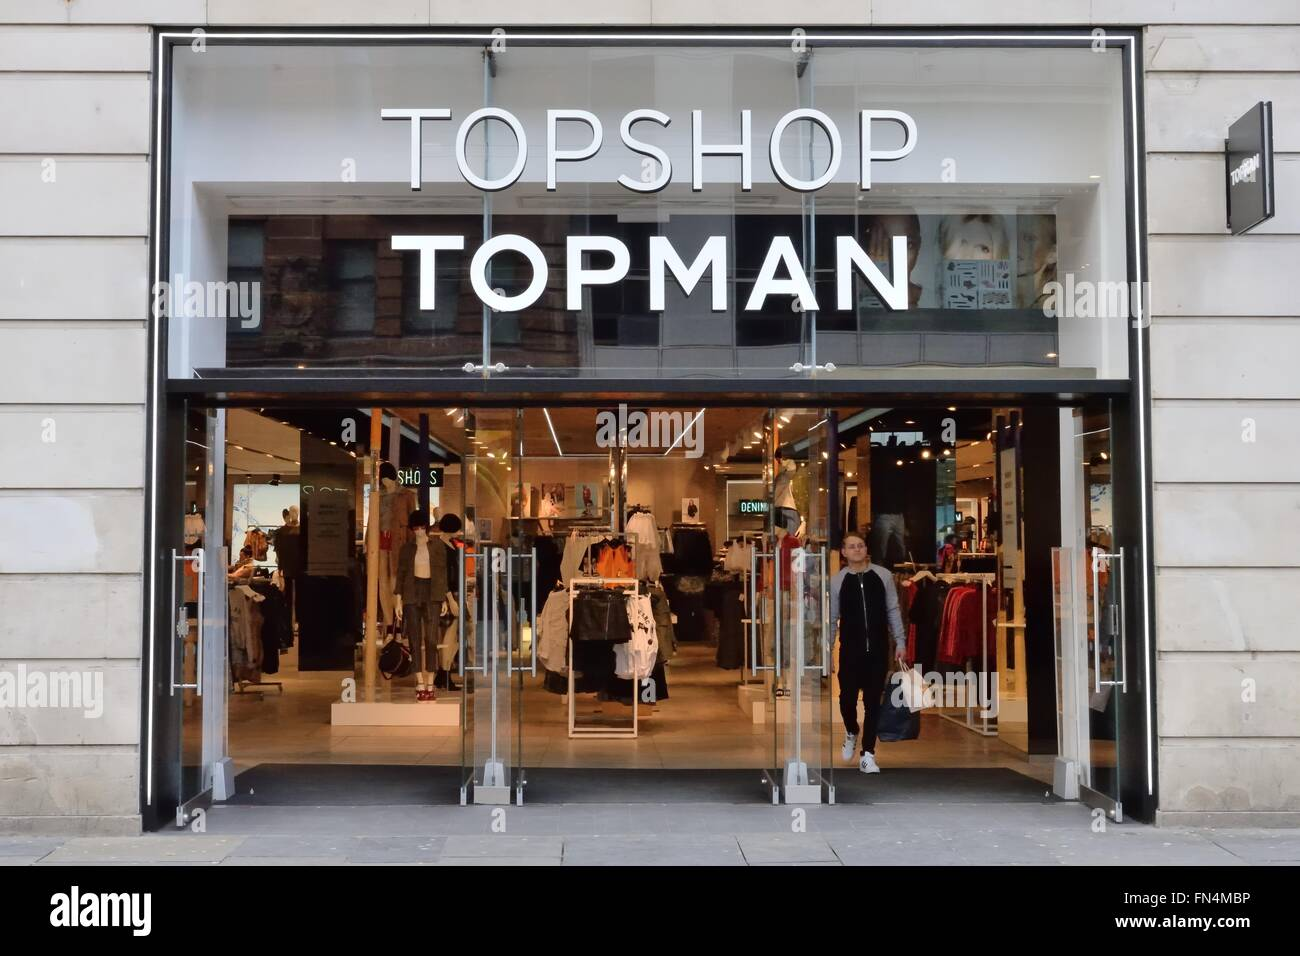 topshop-topman-shop-in-argyle-street-glasgow-city-centre-scotland-FN4MBP.jpg?profile=RESIZE_400x